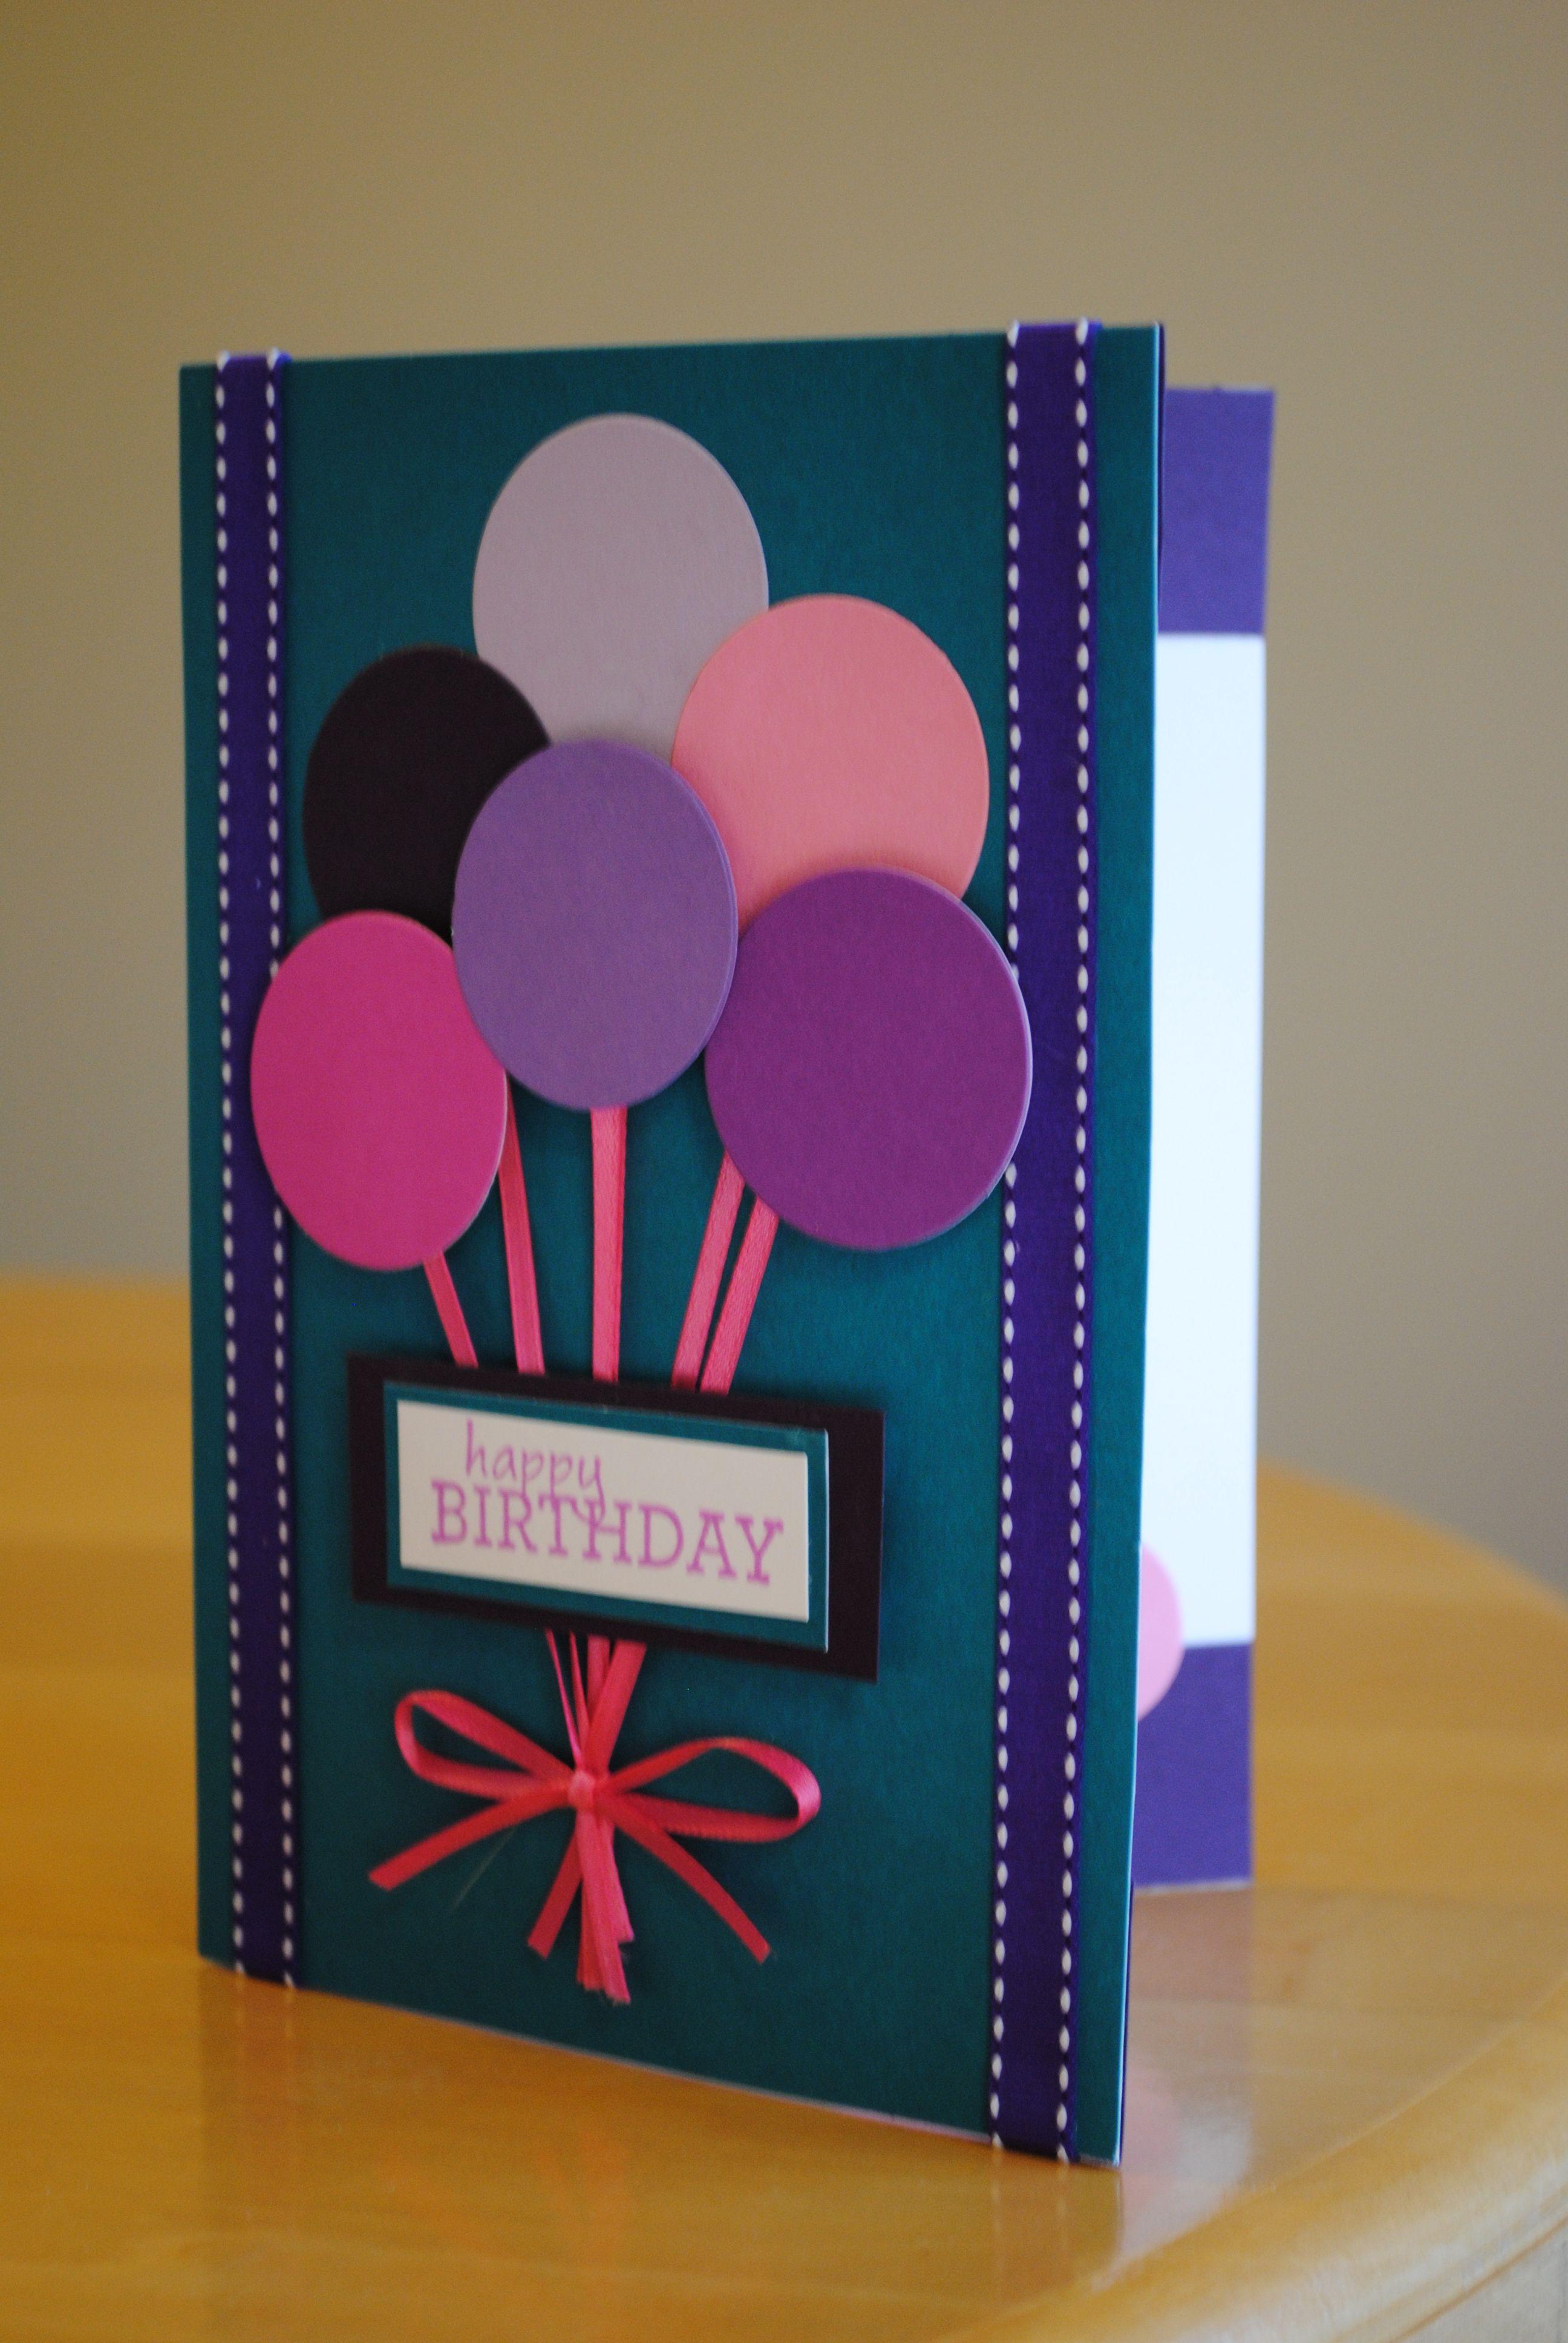 Happy Birthday Card Card Making Birthday Birthday Cards For Boys Handmade Birthday Cards